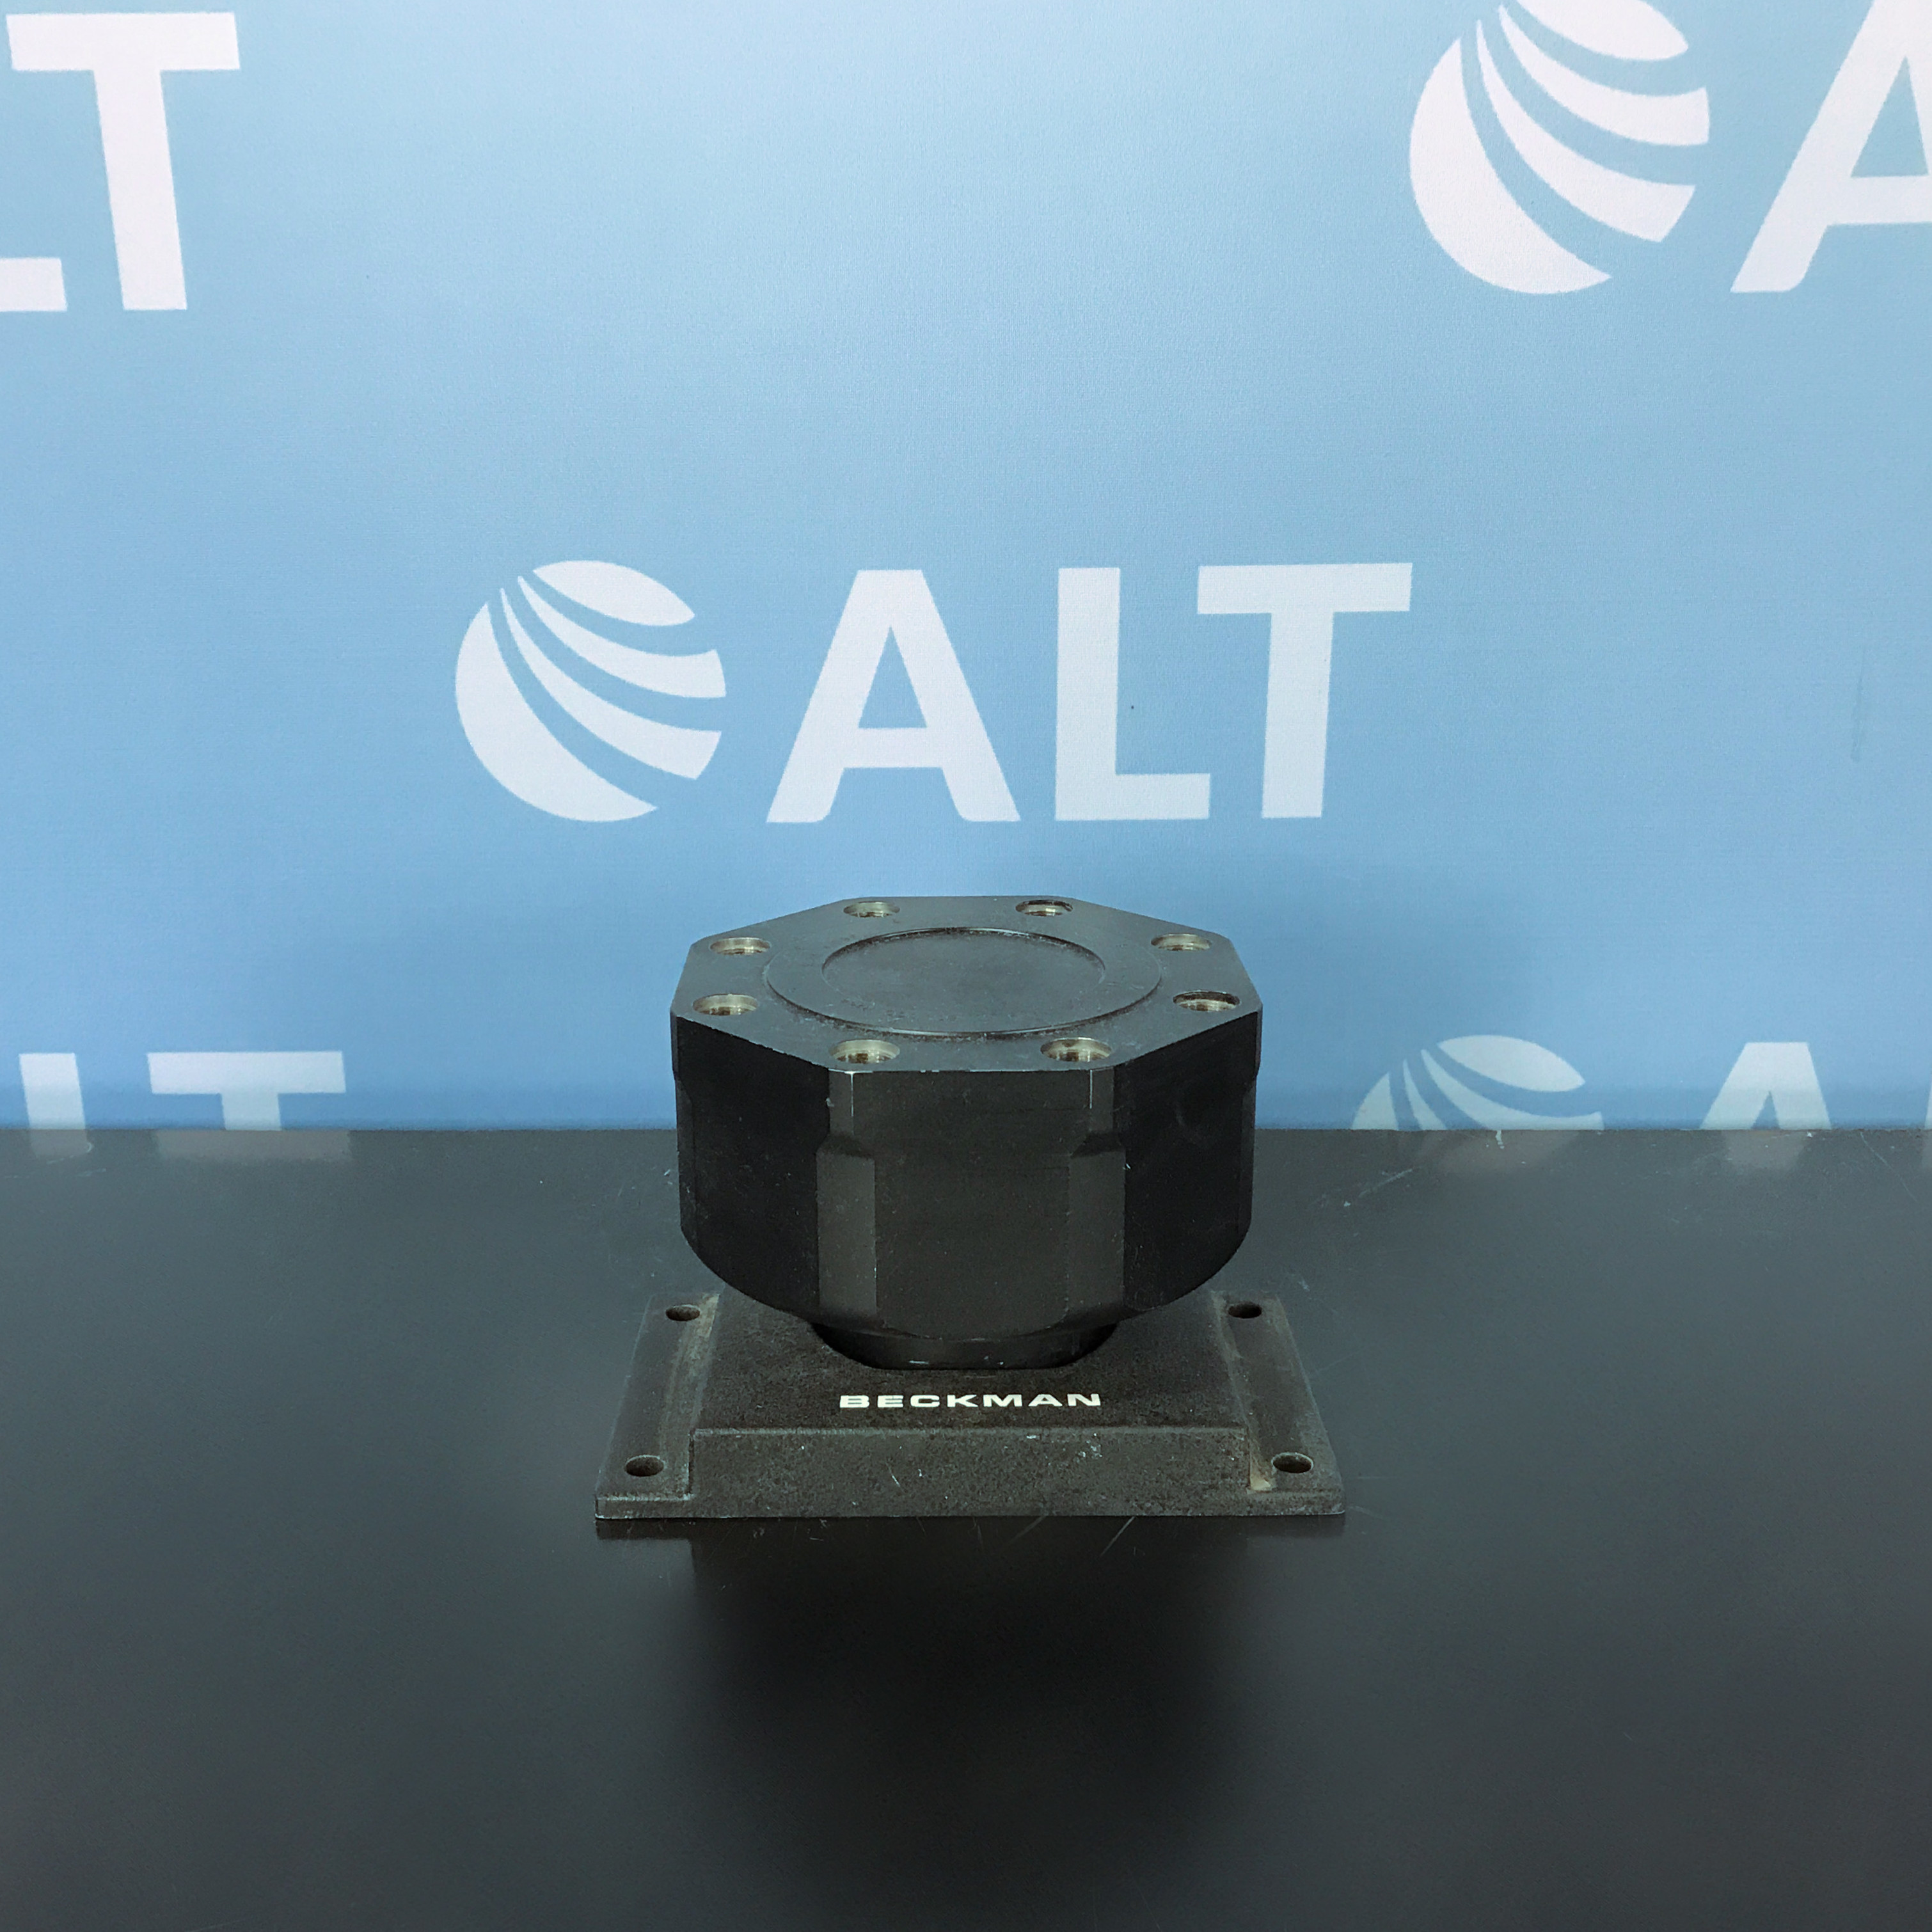 Beckman Coulter VTi80 Rotor Image